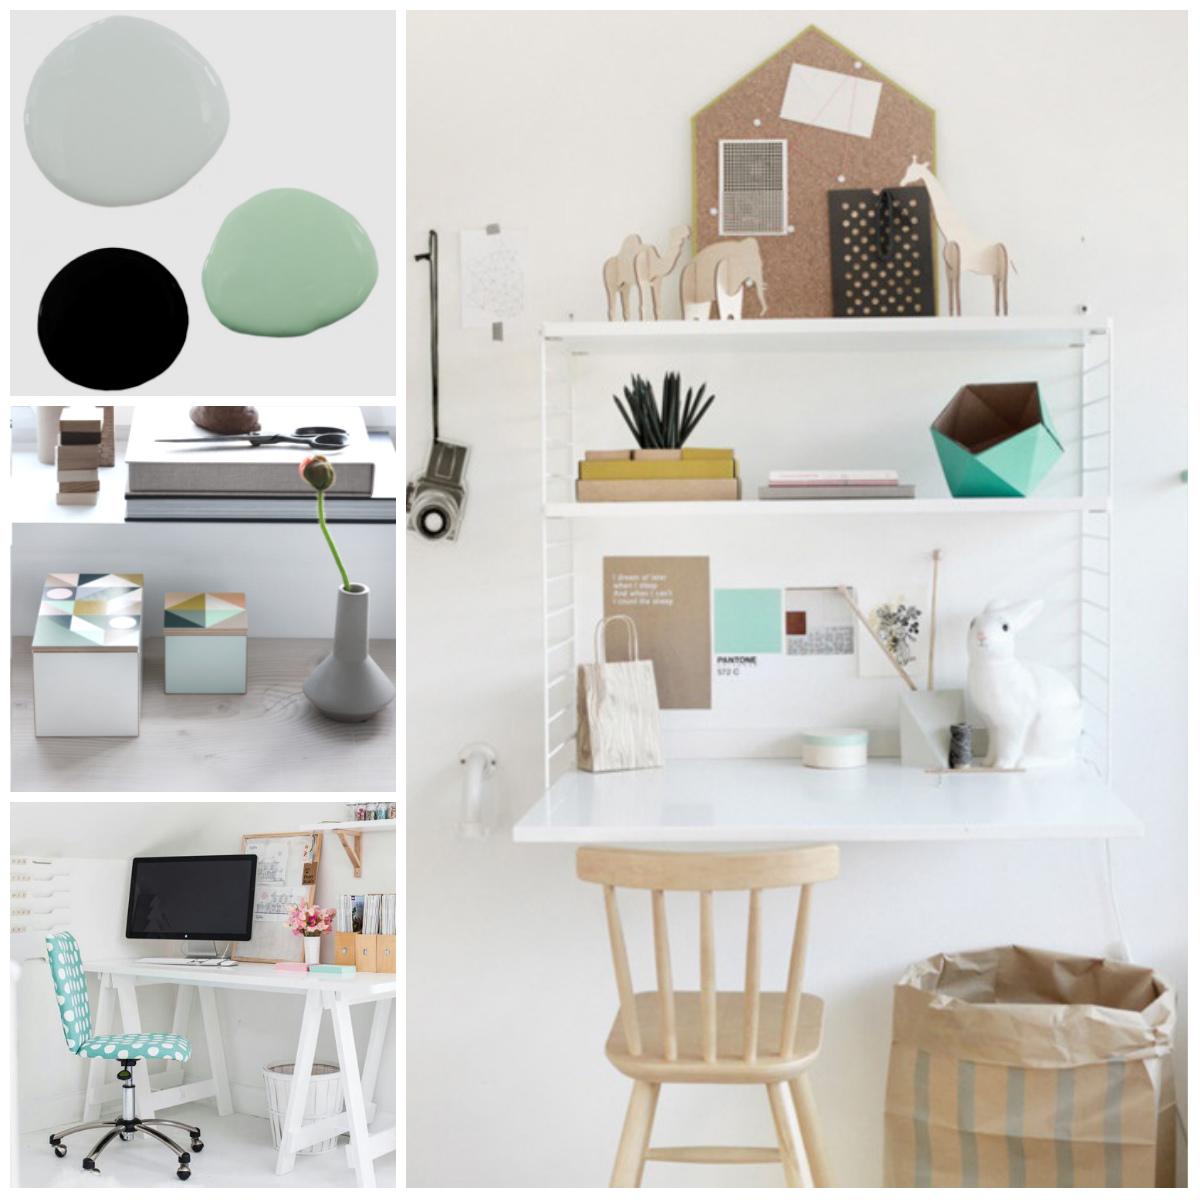 livingloving-diy-project-collage